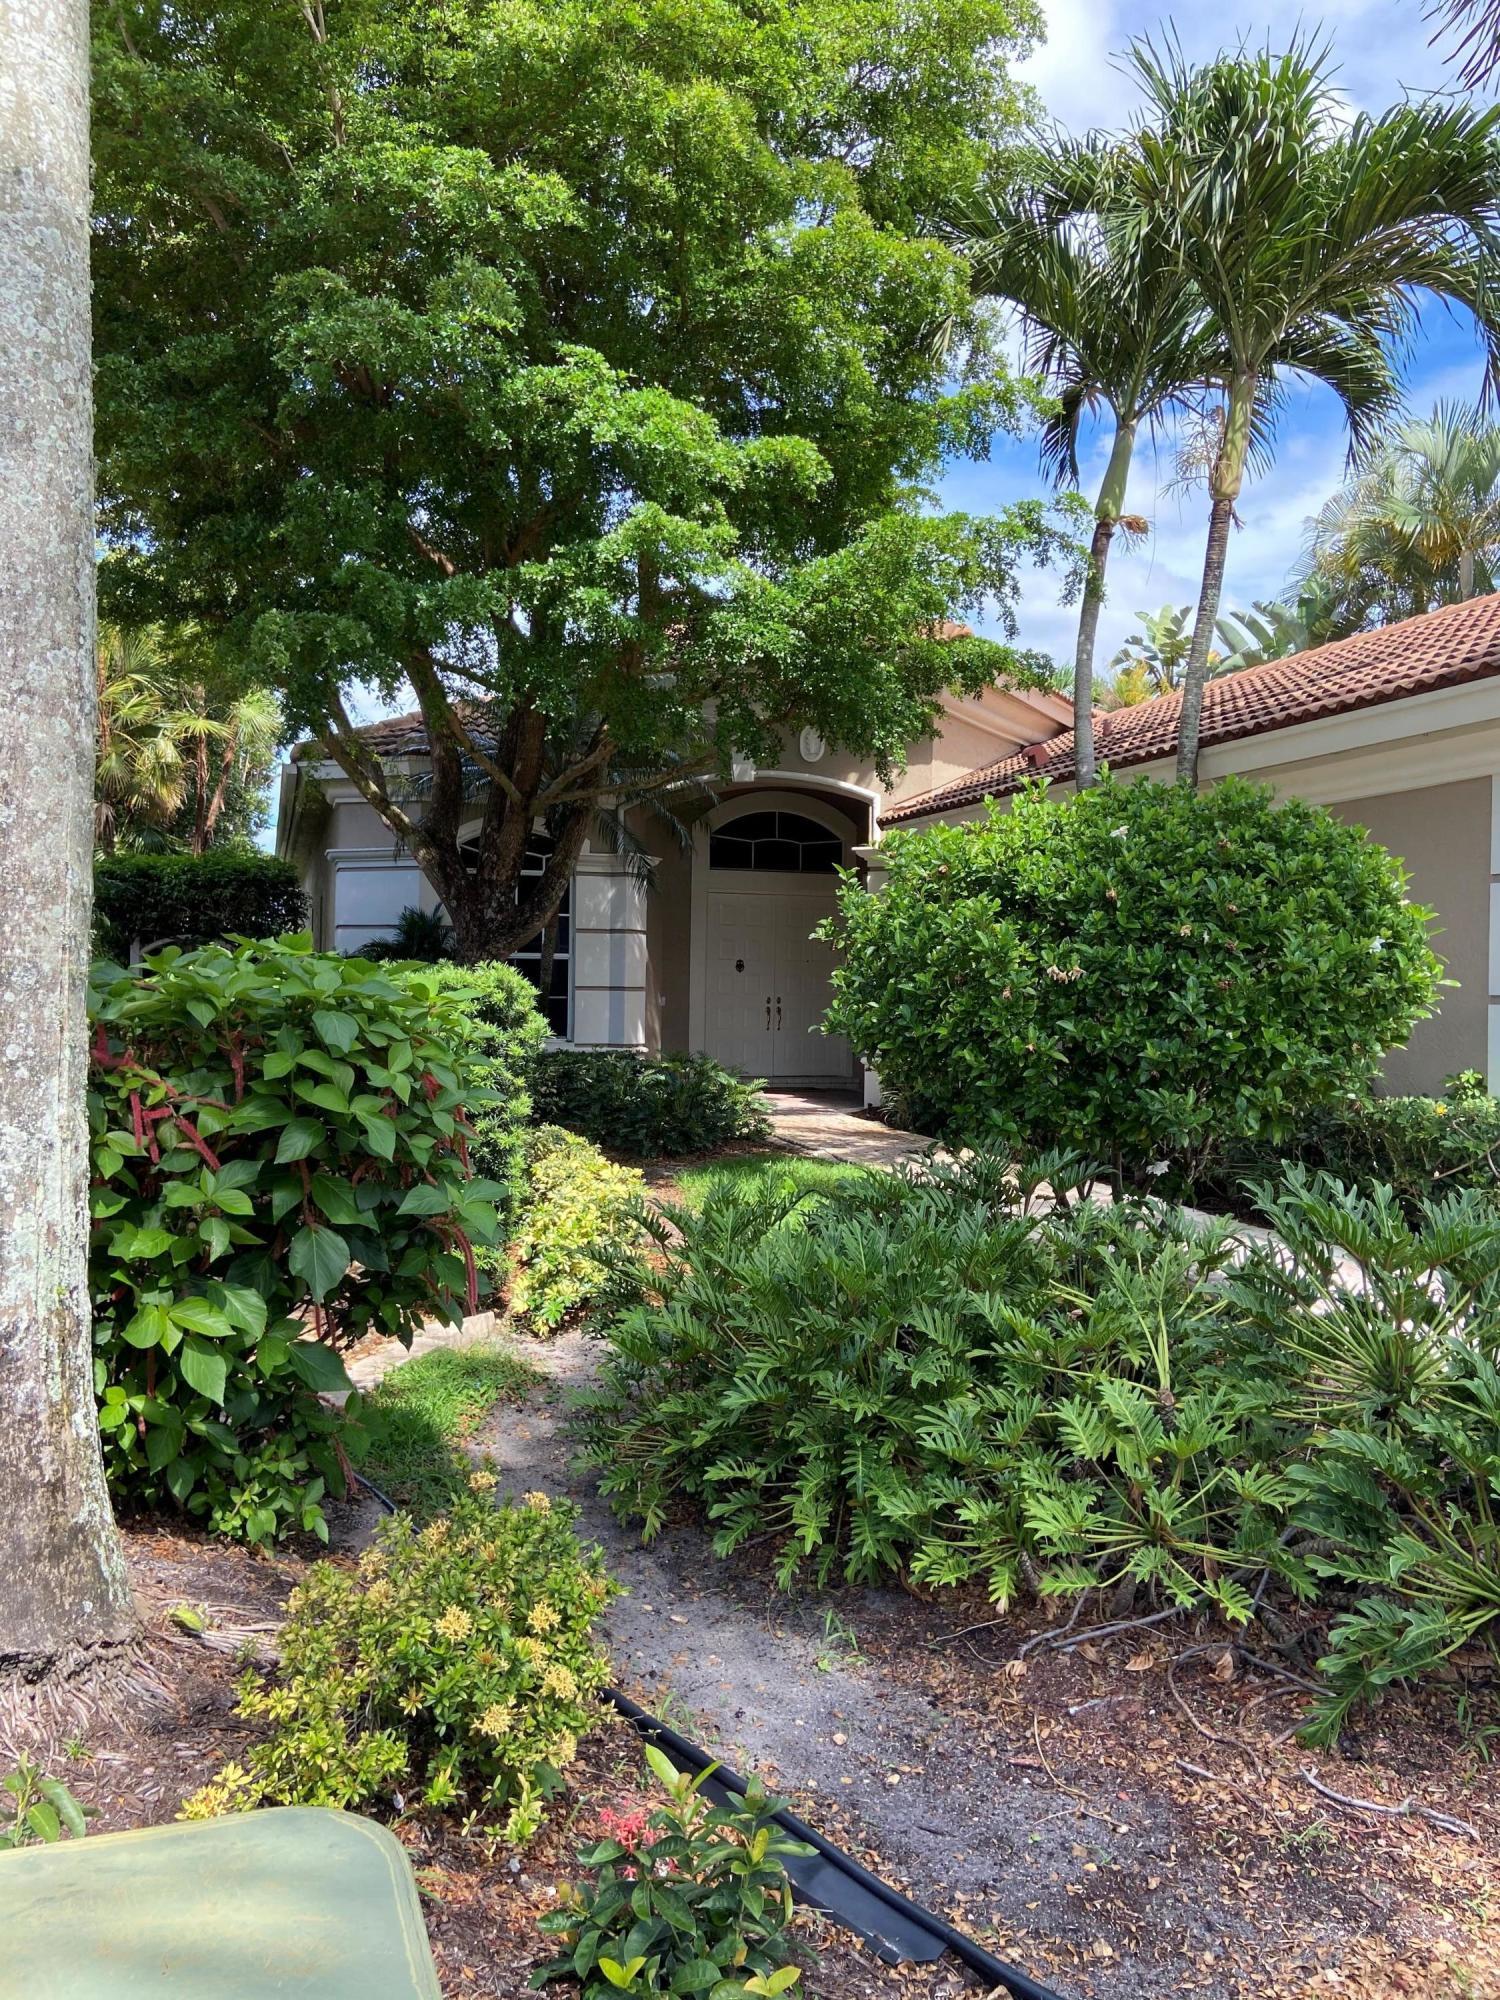 15881  Double Eagle Trail  For Sale 10688940, FL